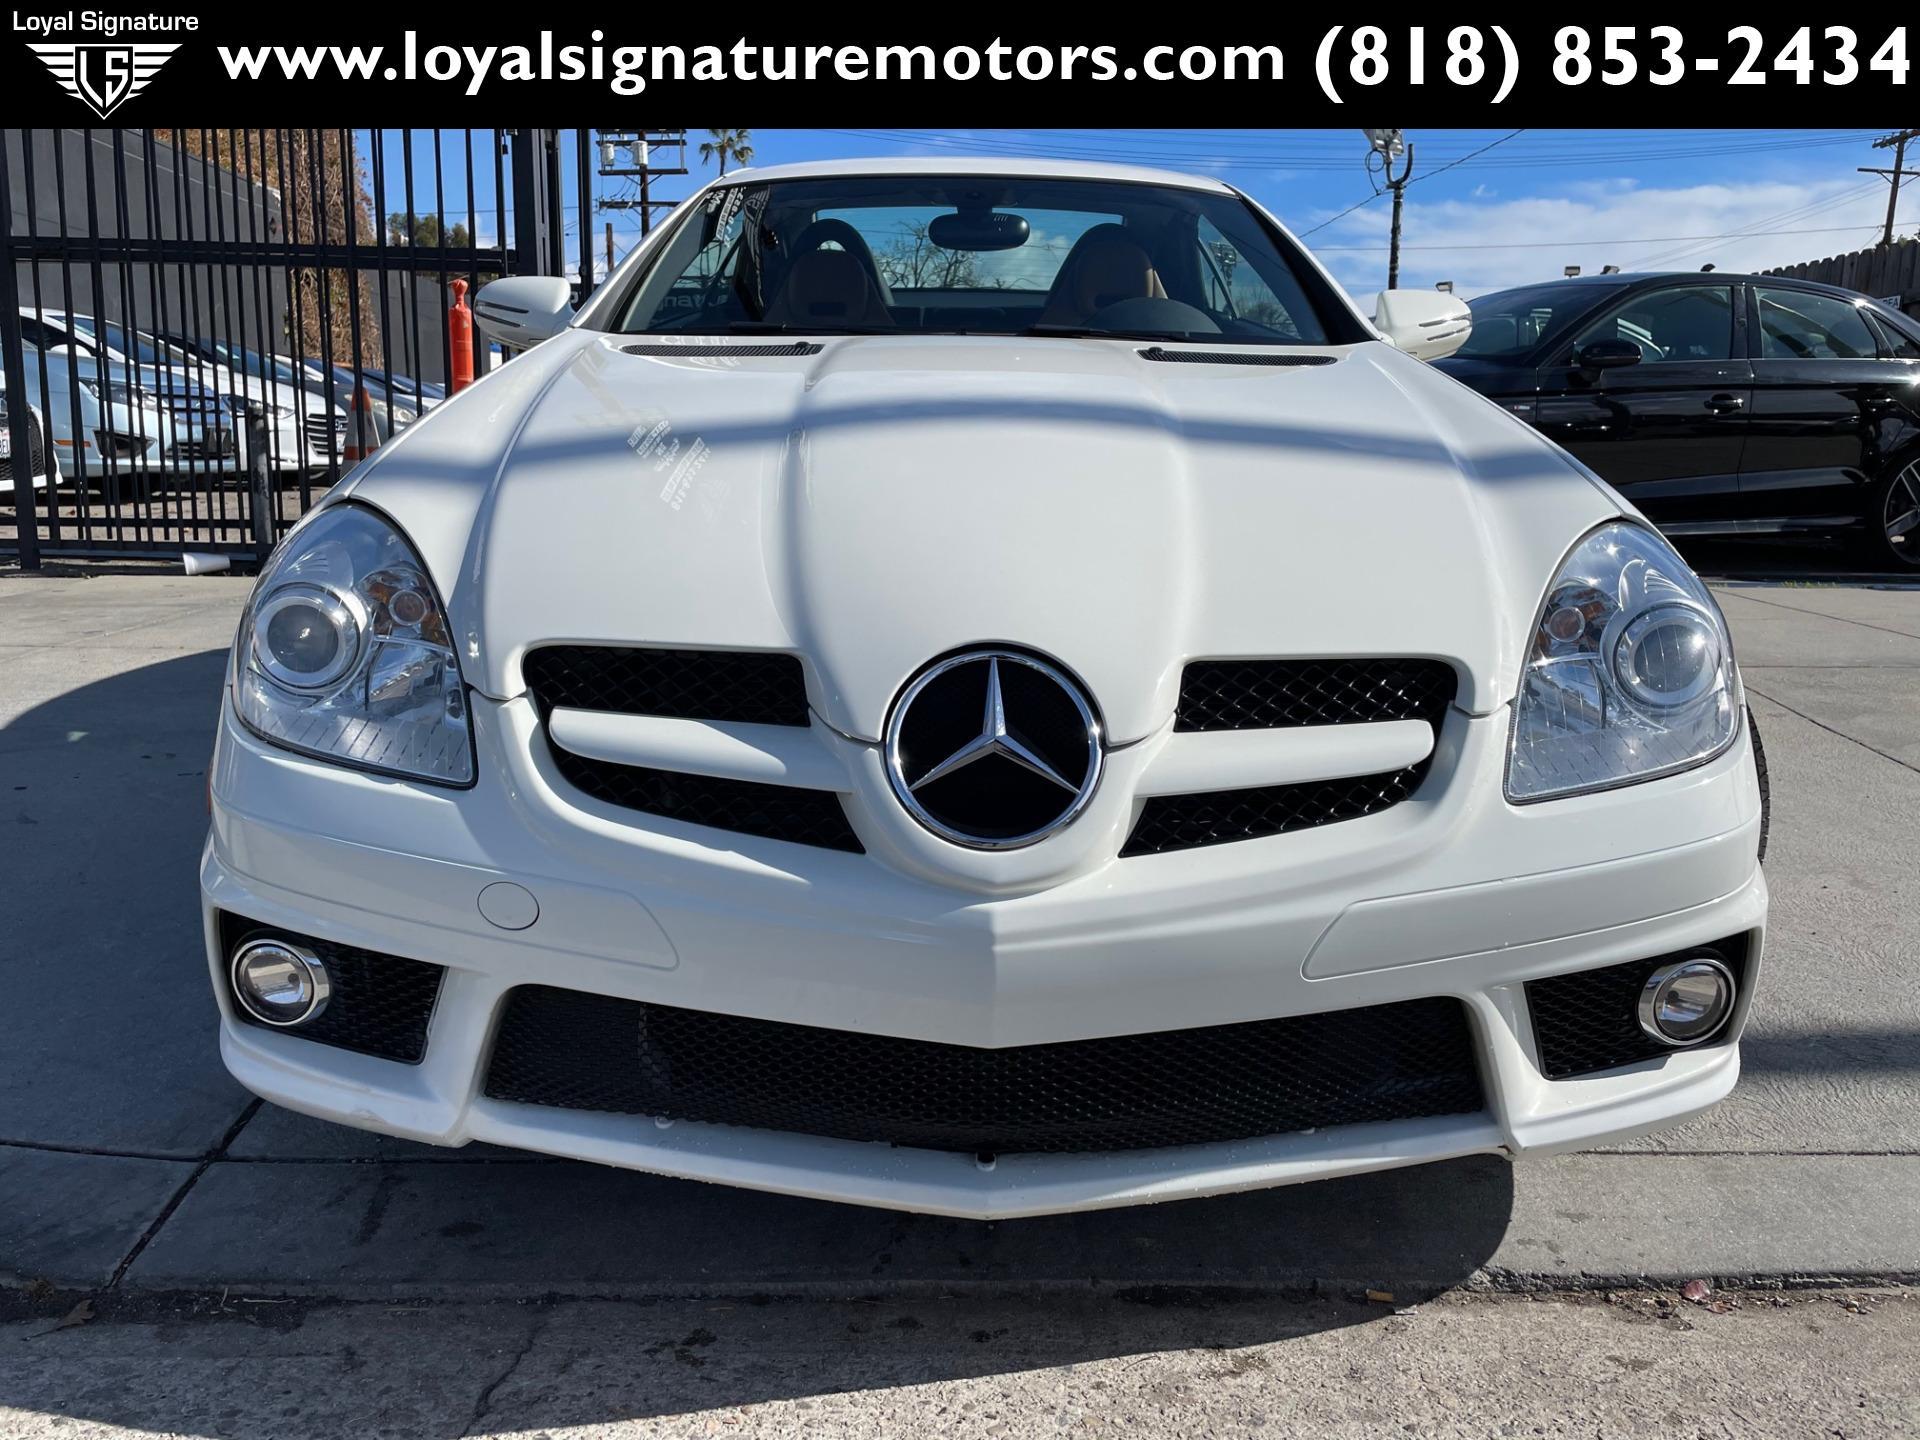 Used-2009-Mercedes-Benz-SLK-SLK-350